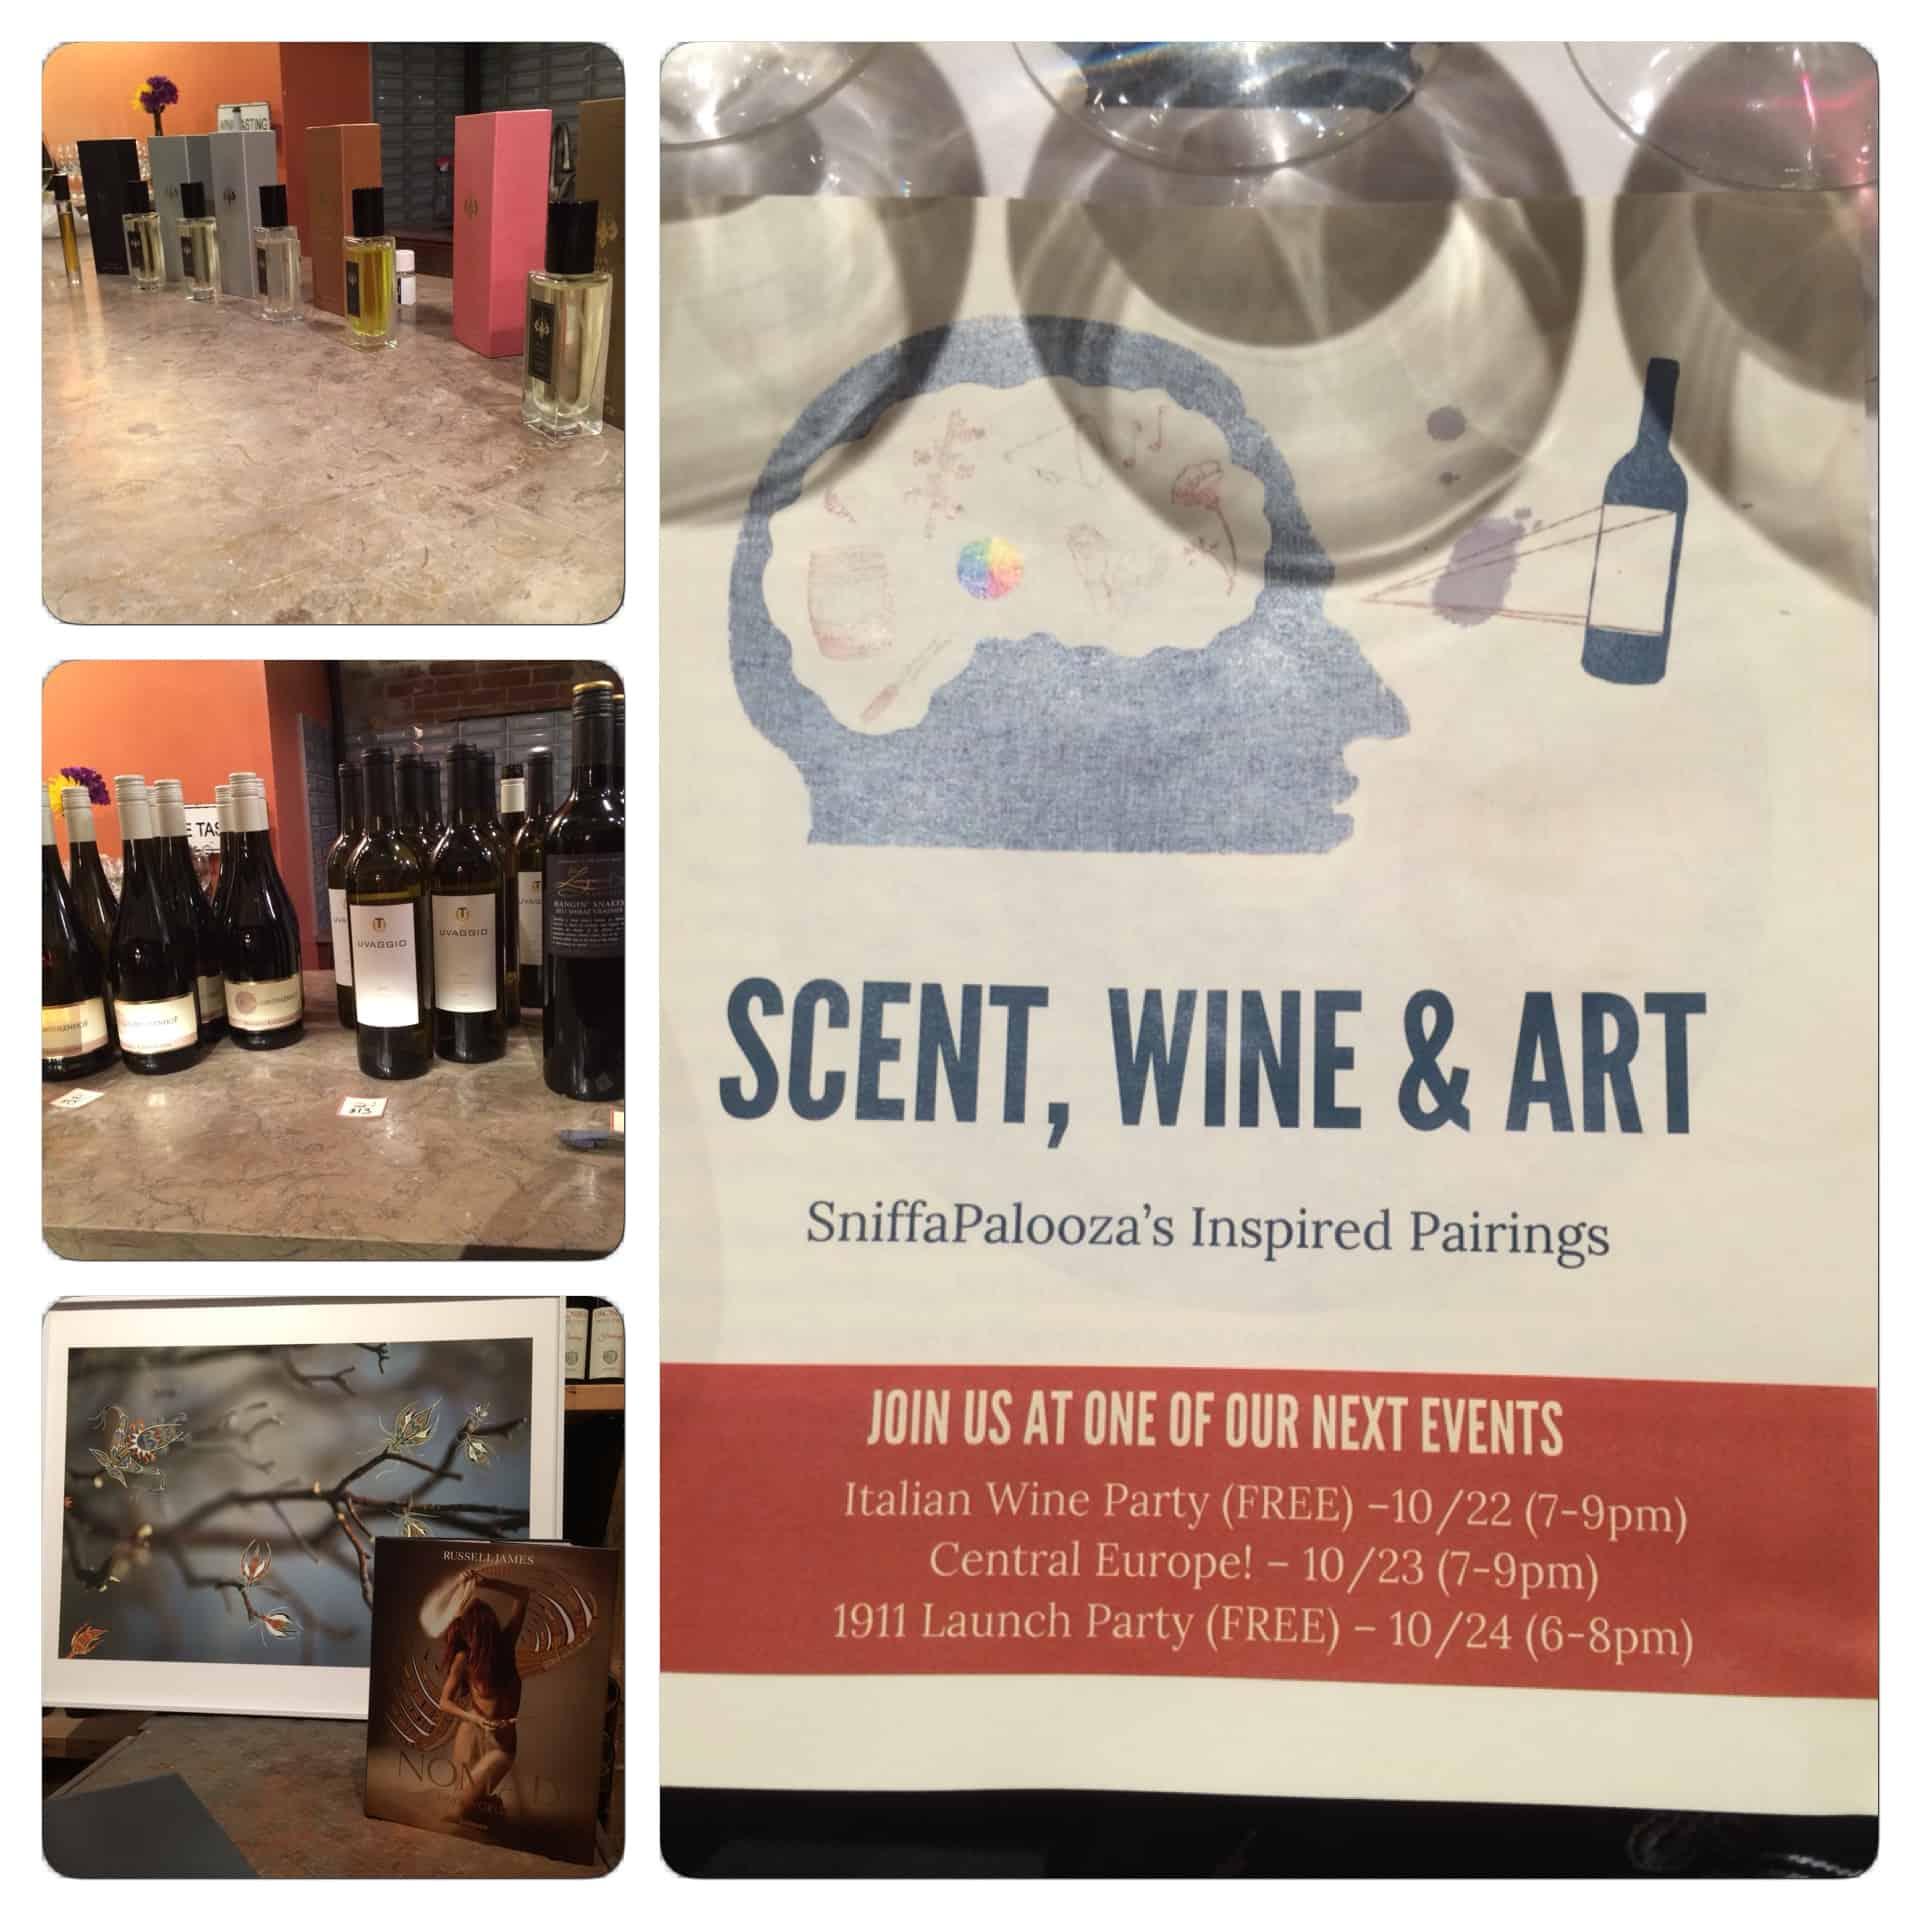 2014 scent wine art 1 copy